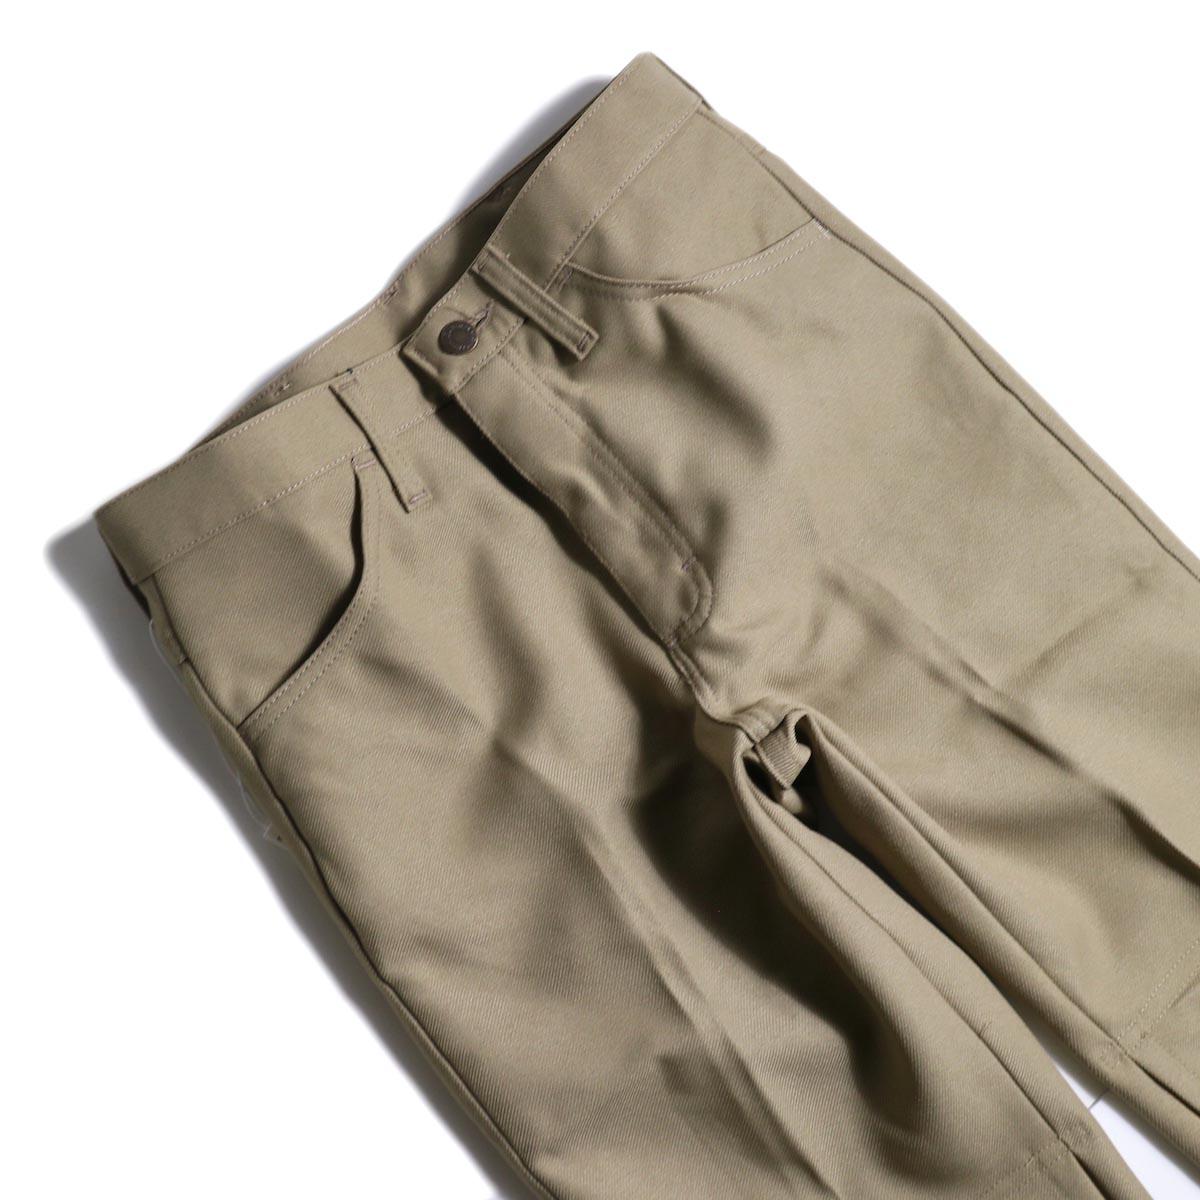 PRE_ / ZK OPEN PANTS (Tan)ウエスト